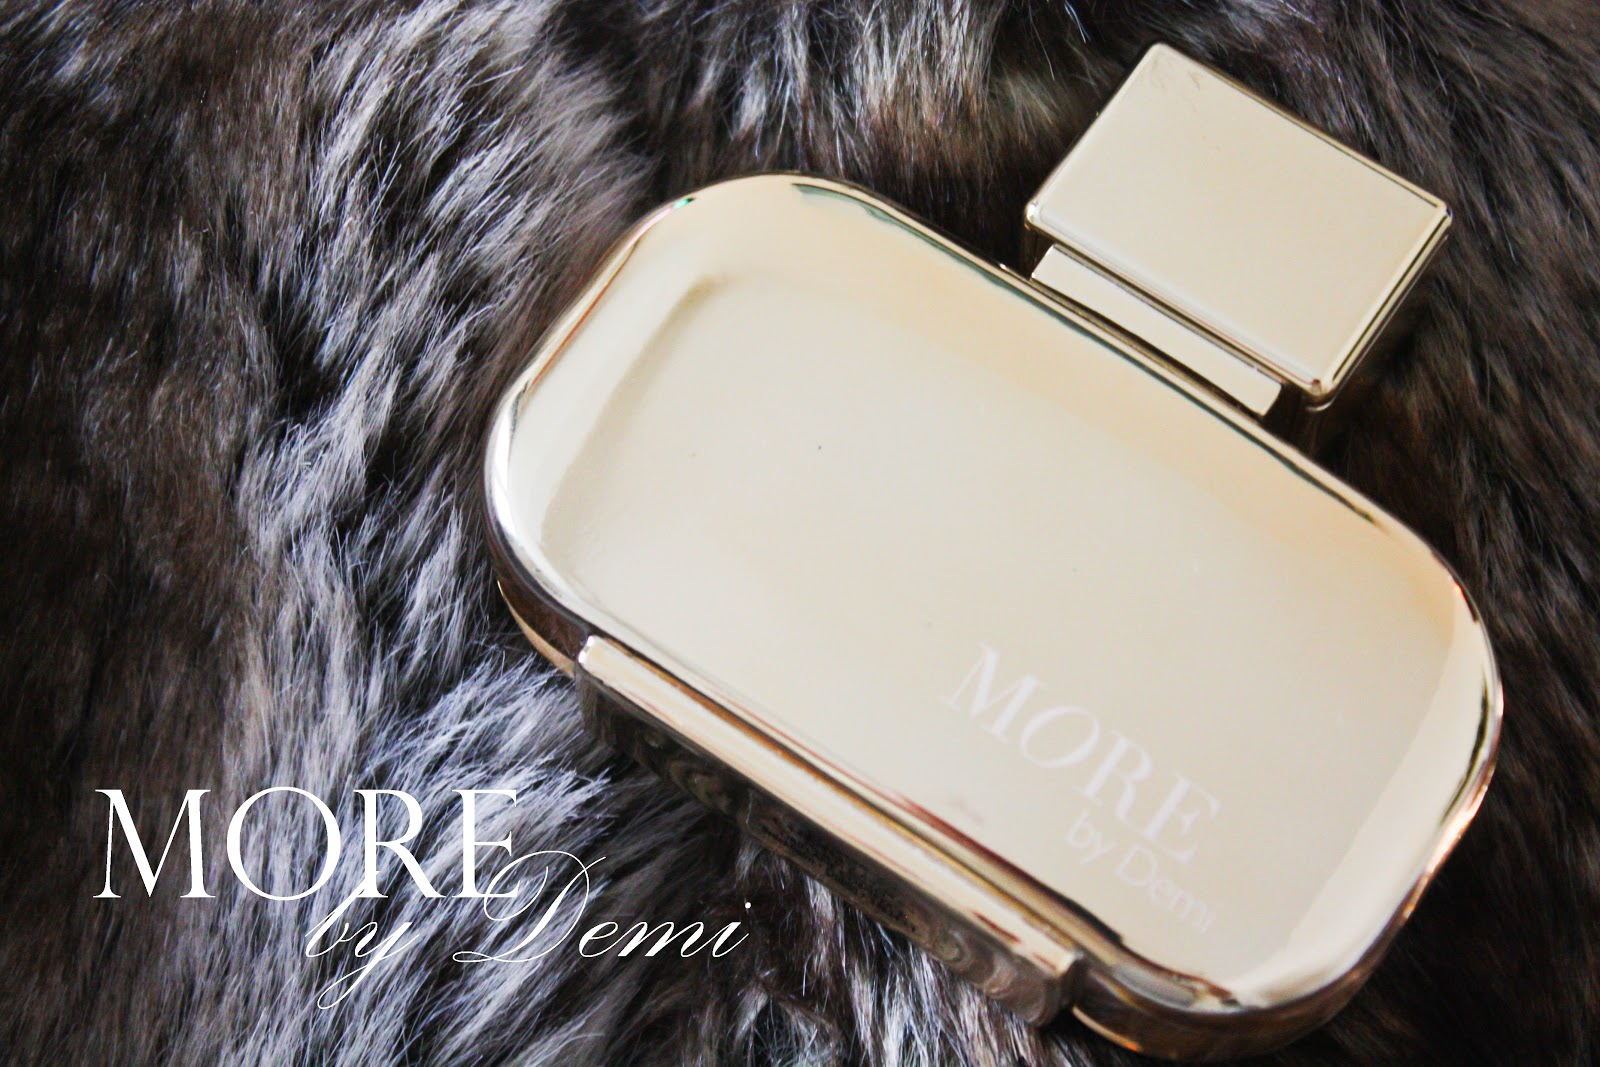 http://1.bp.blogspot.com/-pZXQgDTJCFk/UMDB0eaAEJI/AAAAAAAAGnY/GcD_ELndkWY/s1600/more+by+demi+oriflame+perfume+review.jpg